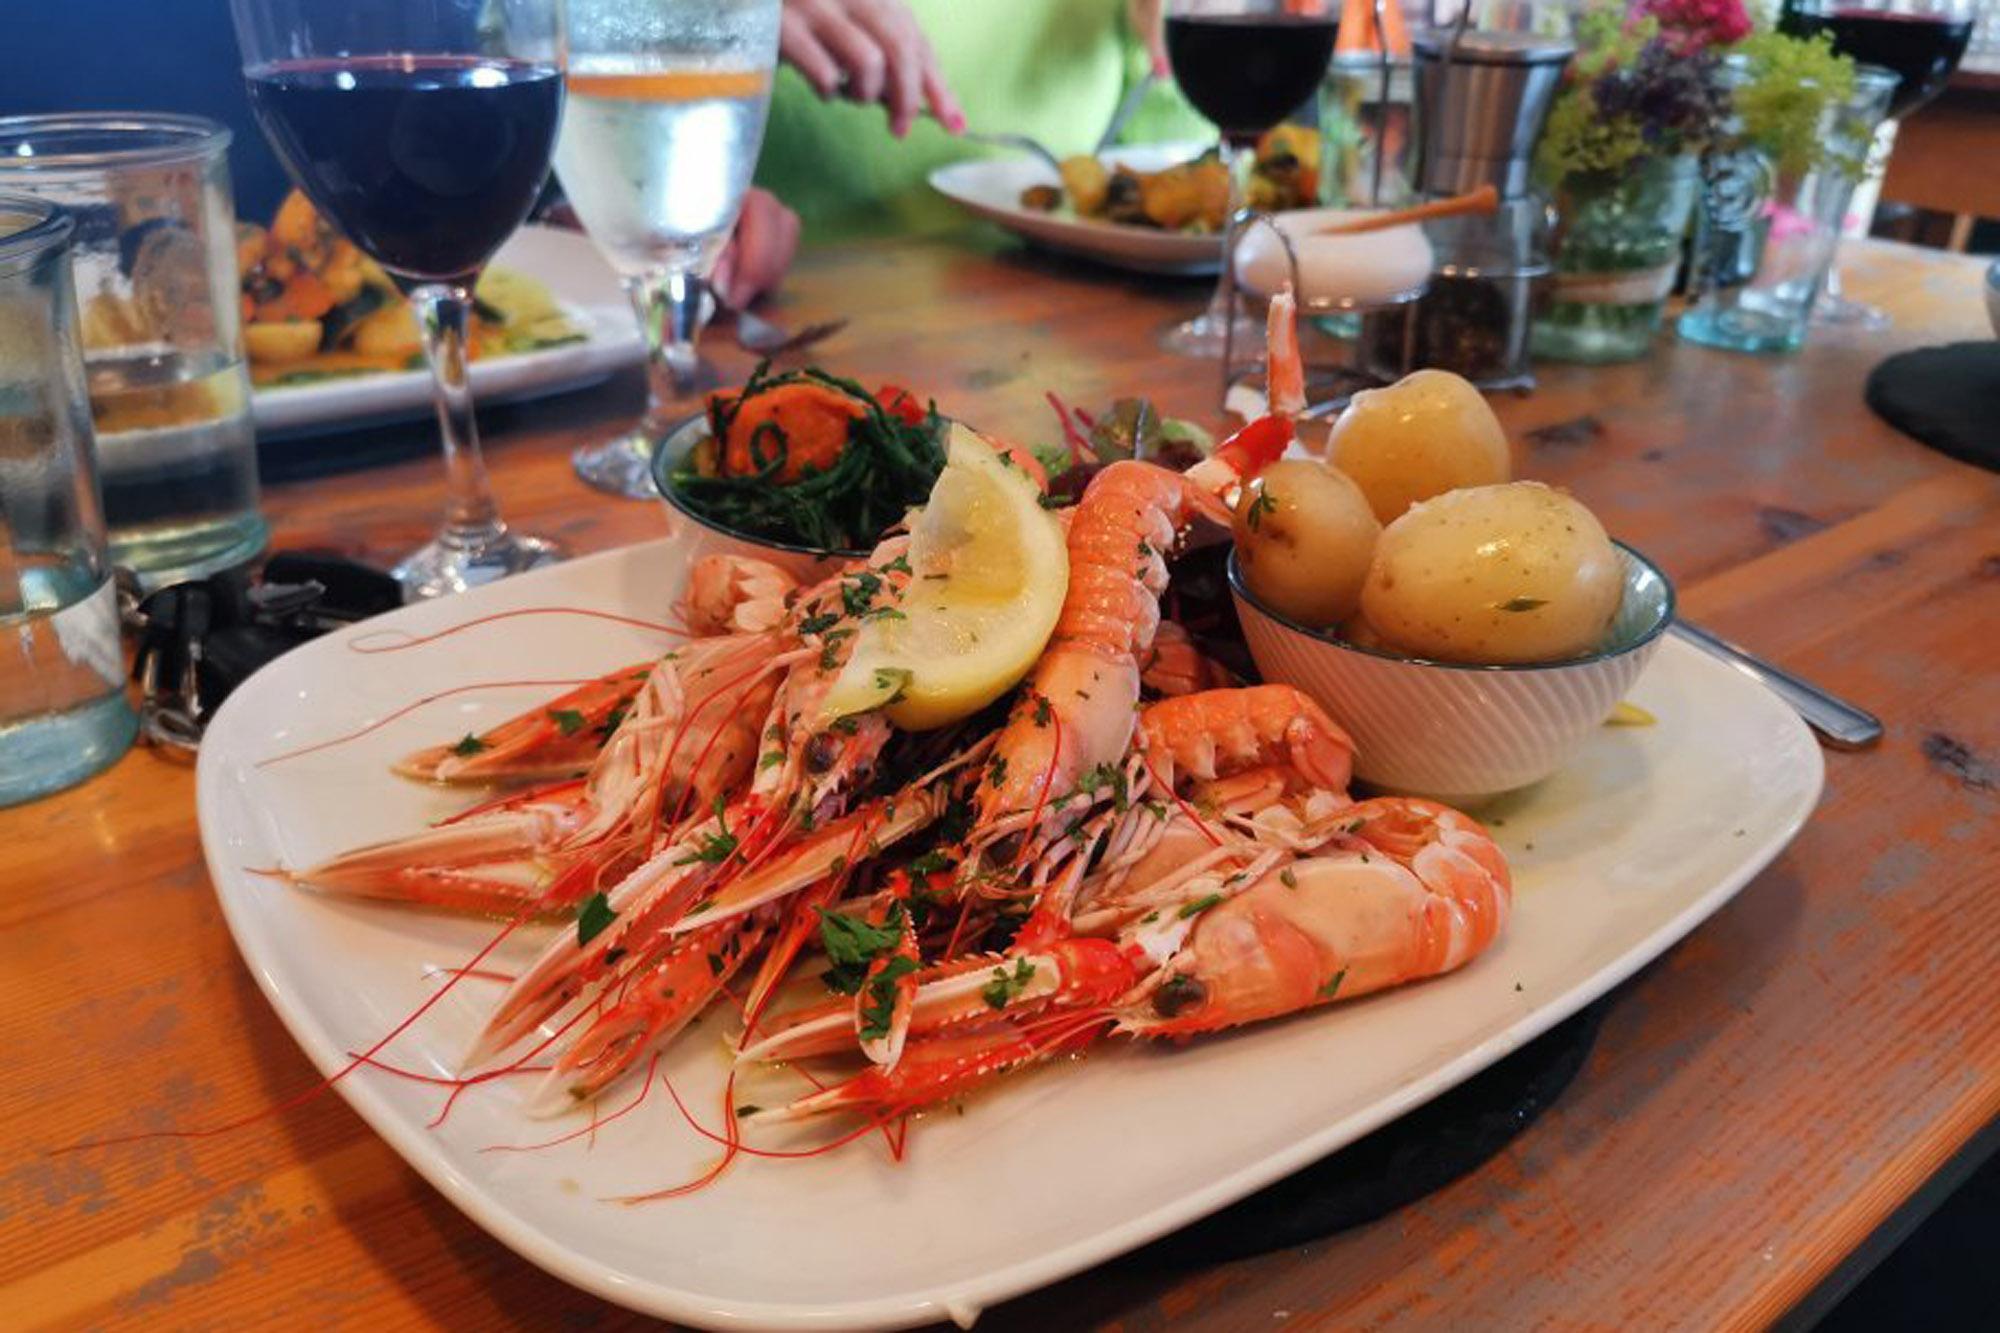 Shrimp at The Dornie | Seafood restaurant near Skye